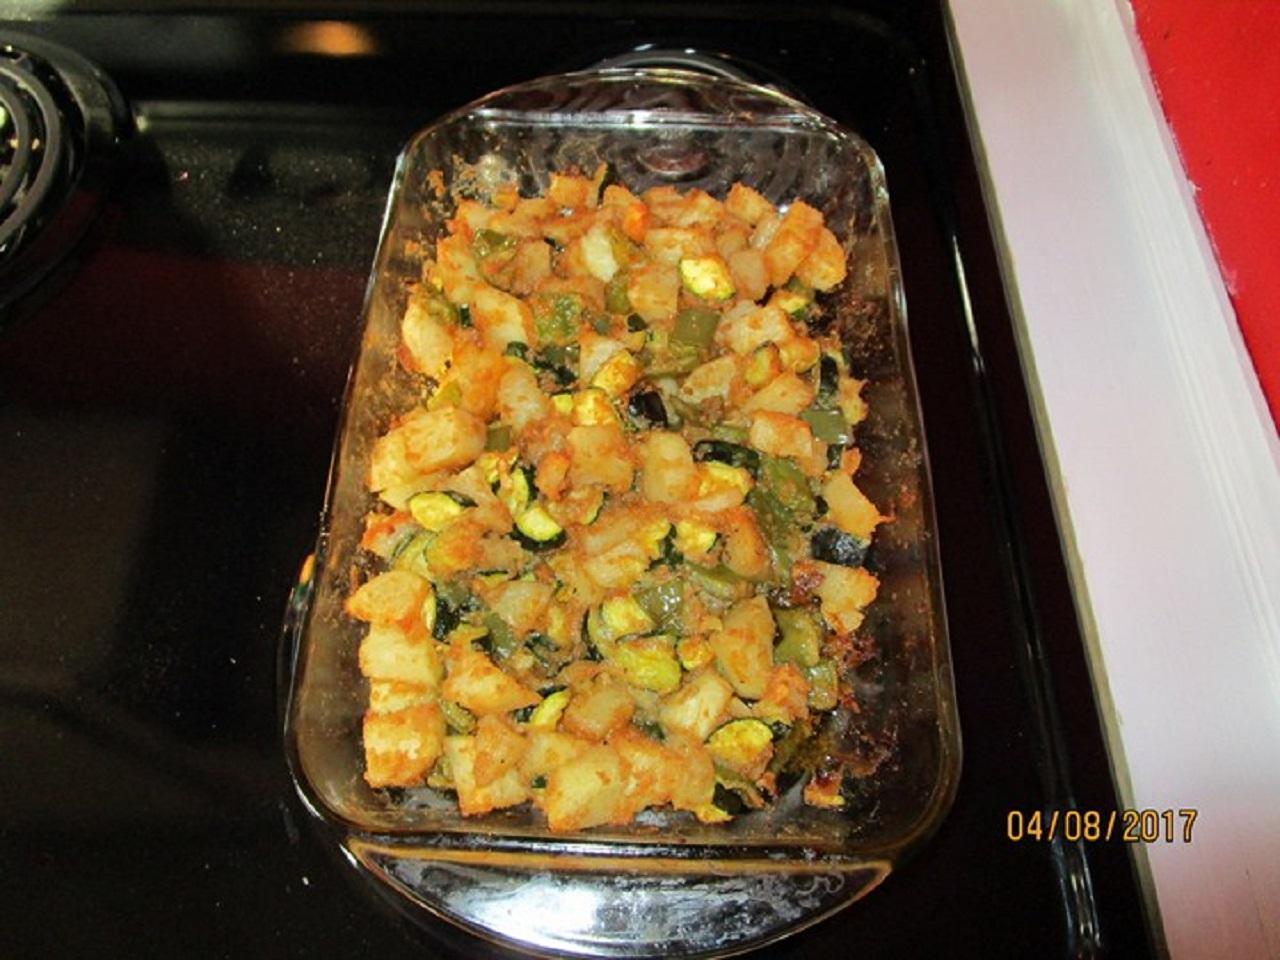 Zucchini and Potato Bake